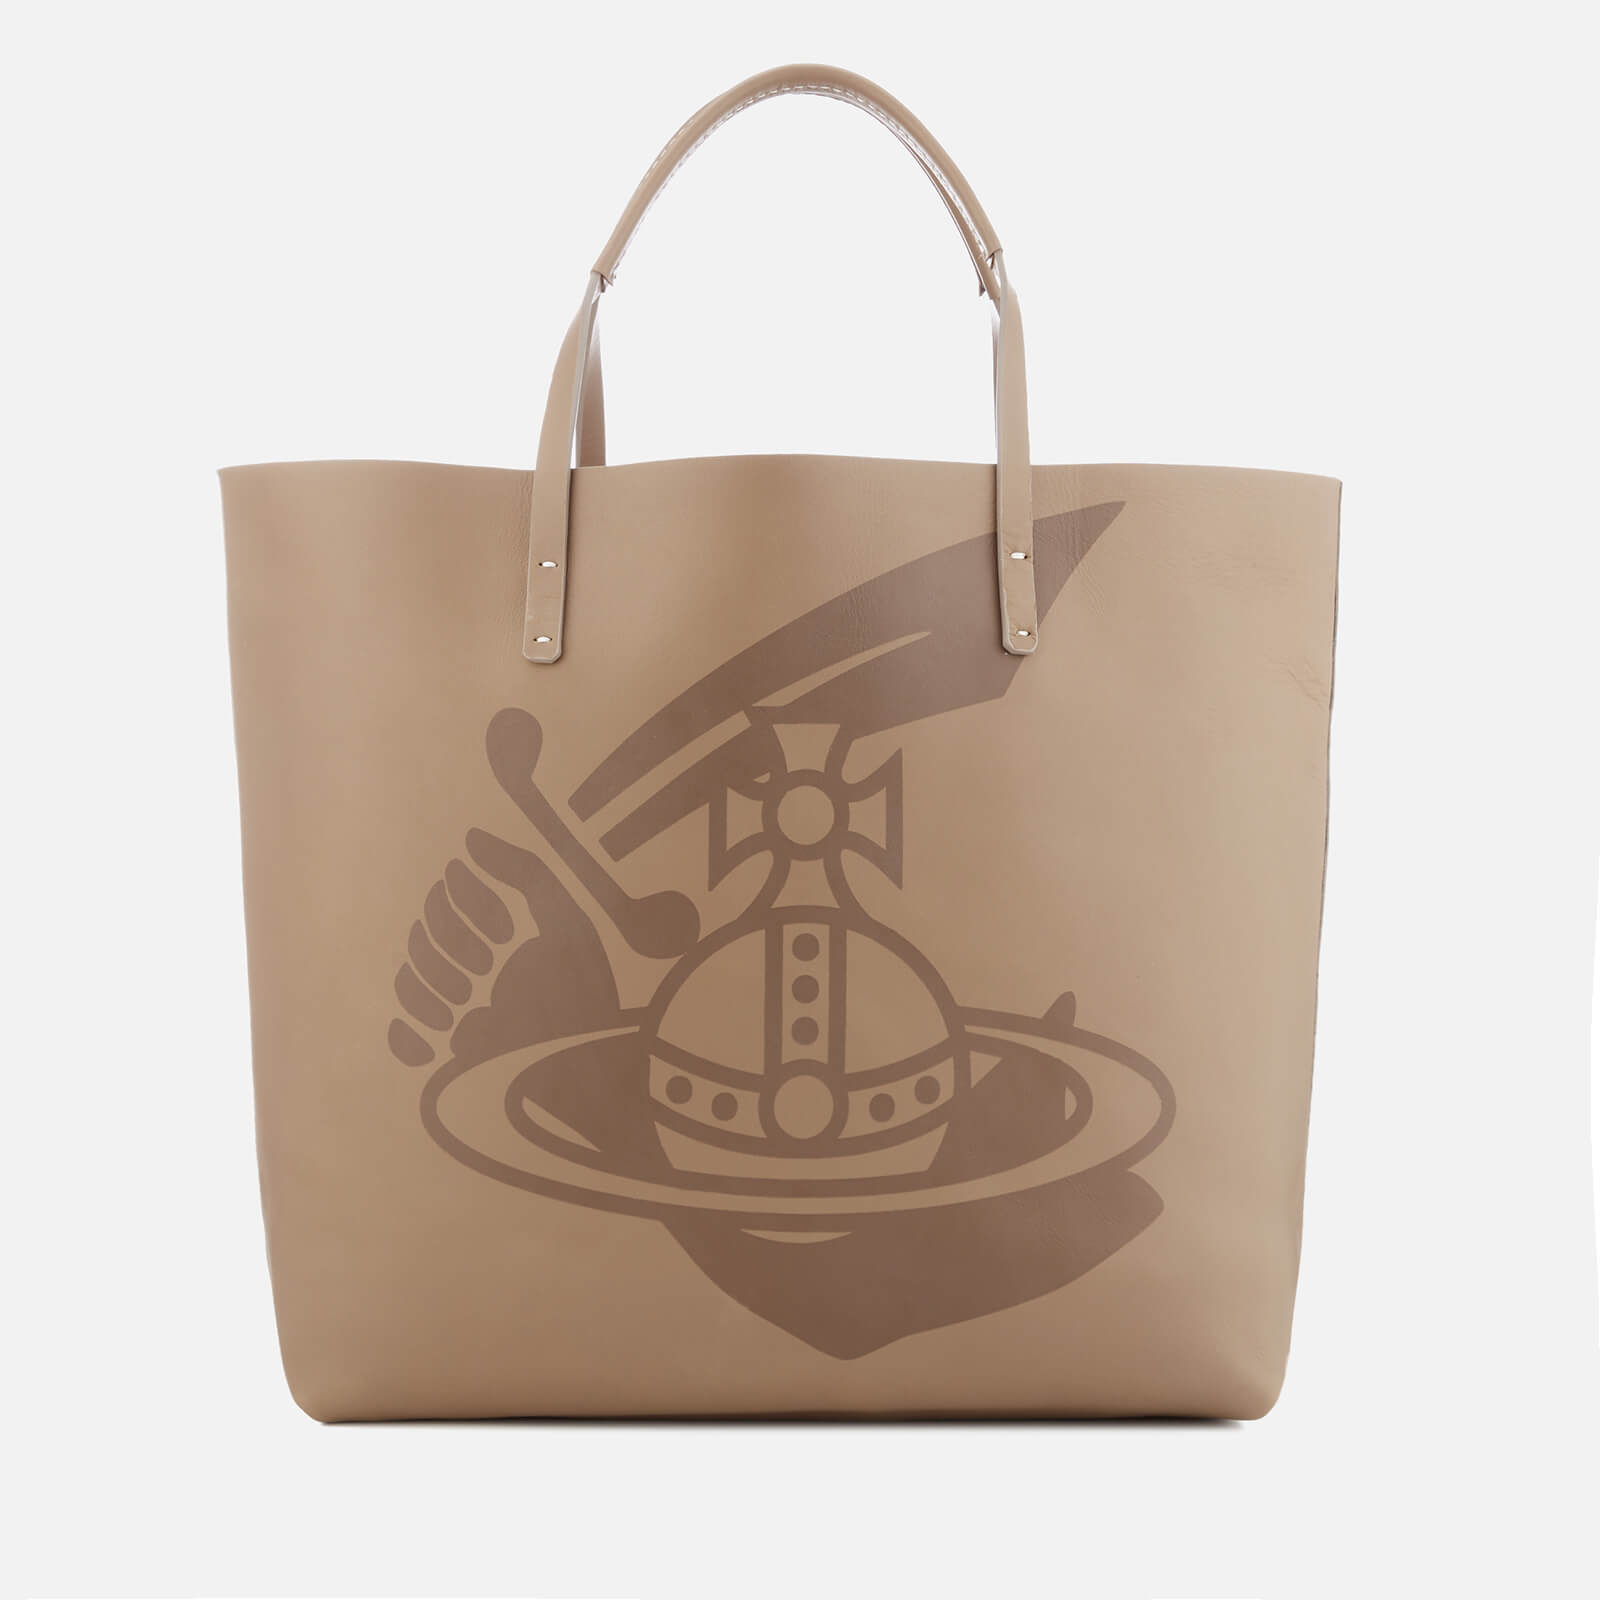 804342a0ff4 Vivienne Westwood Women's Made in Kenya Leather Shopper Bag - Beige - Free  UK Delivery over £50